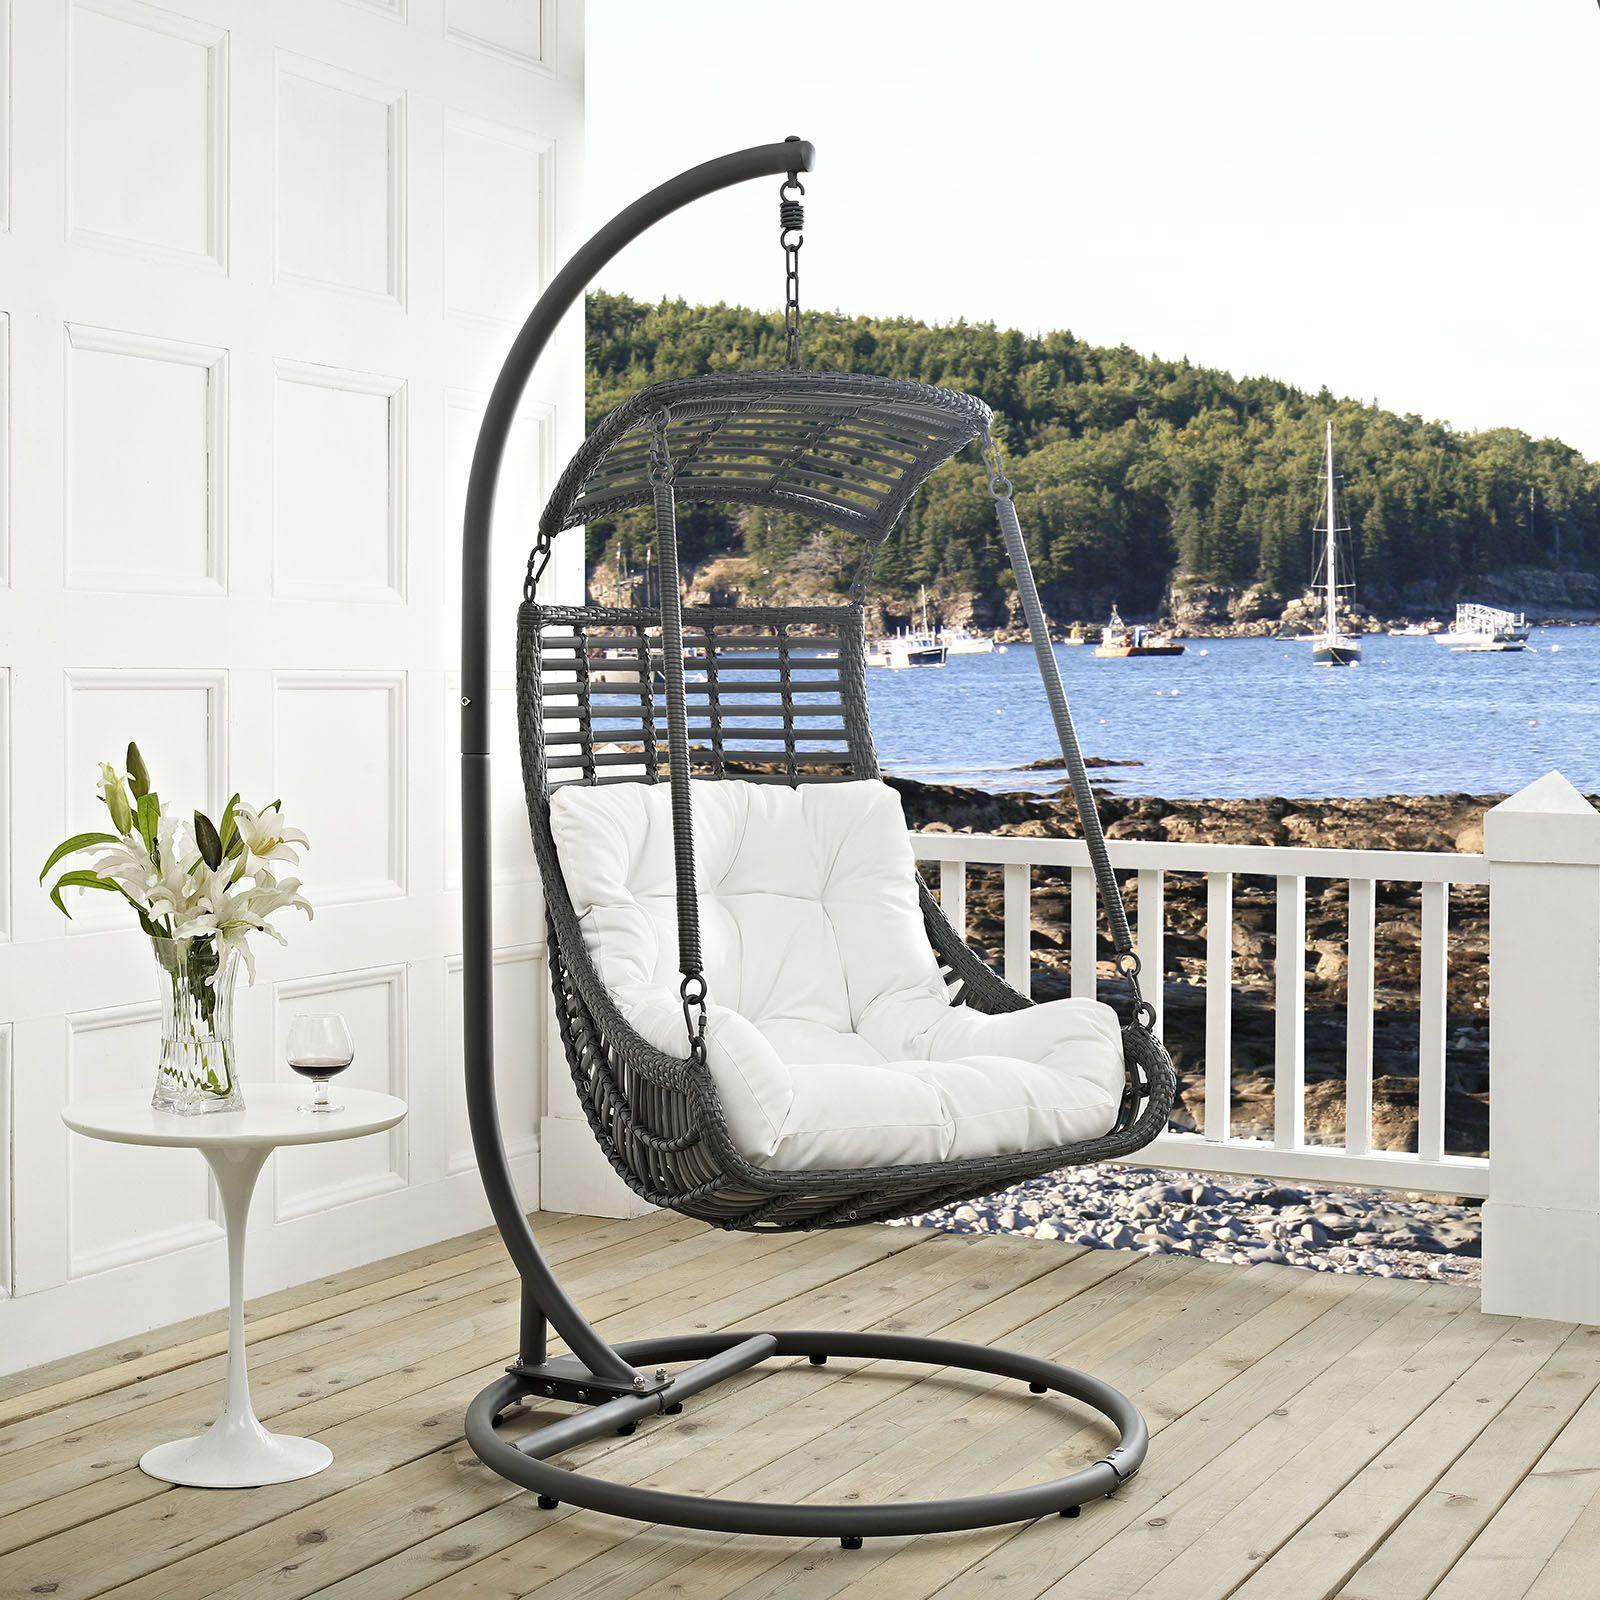 jungle pe rattan white fabric steel frame outdoor patio swing chair